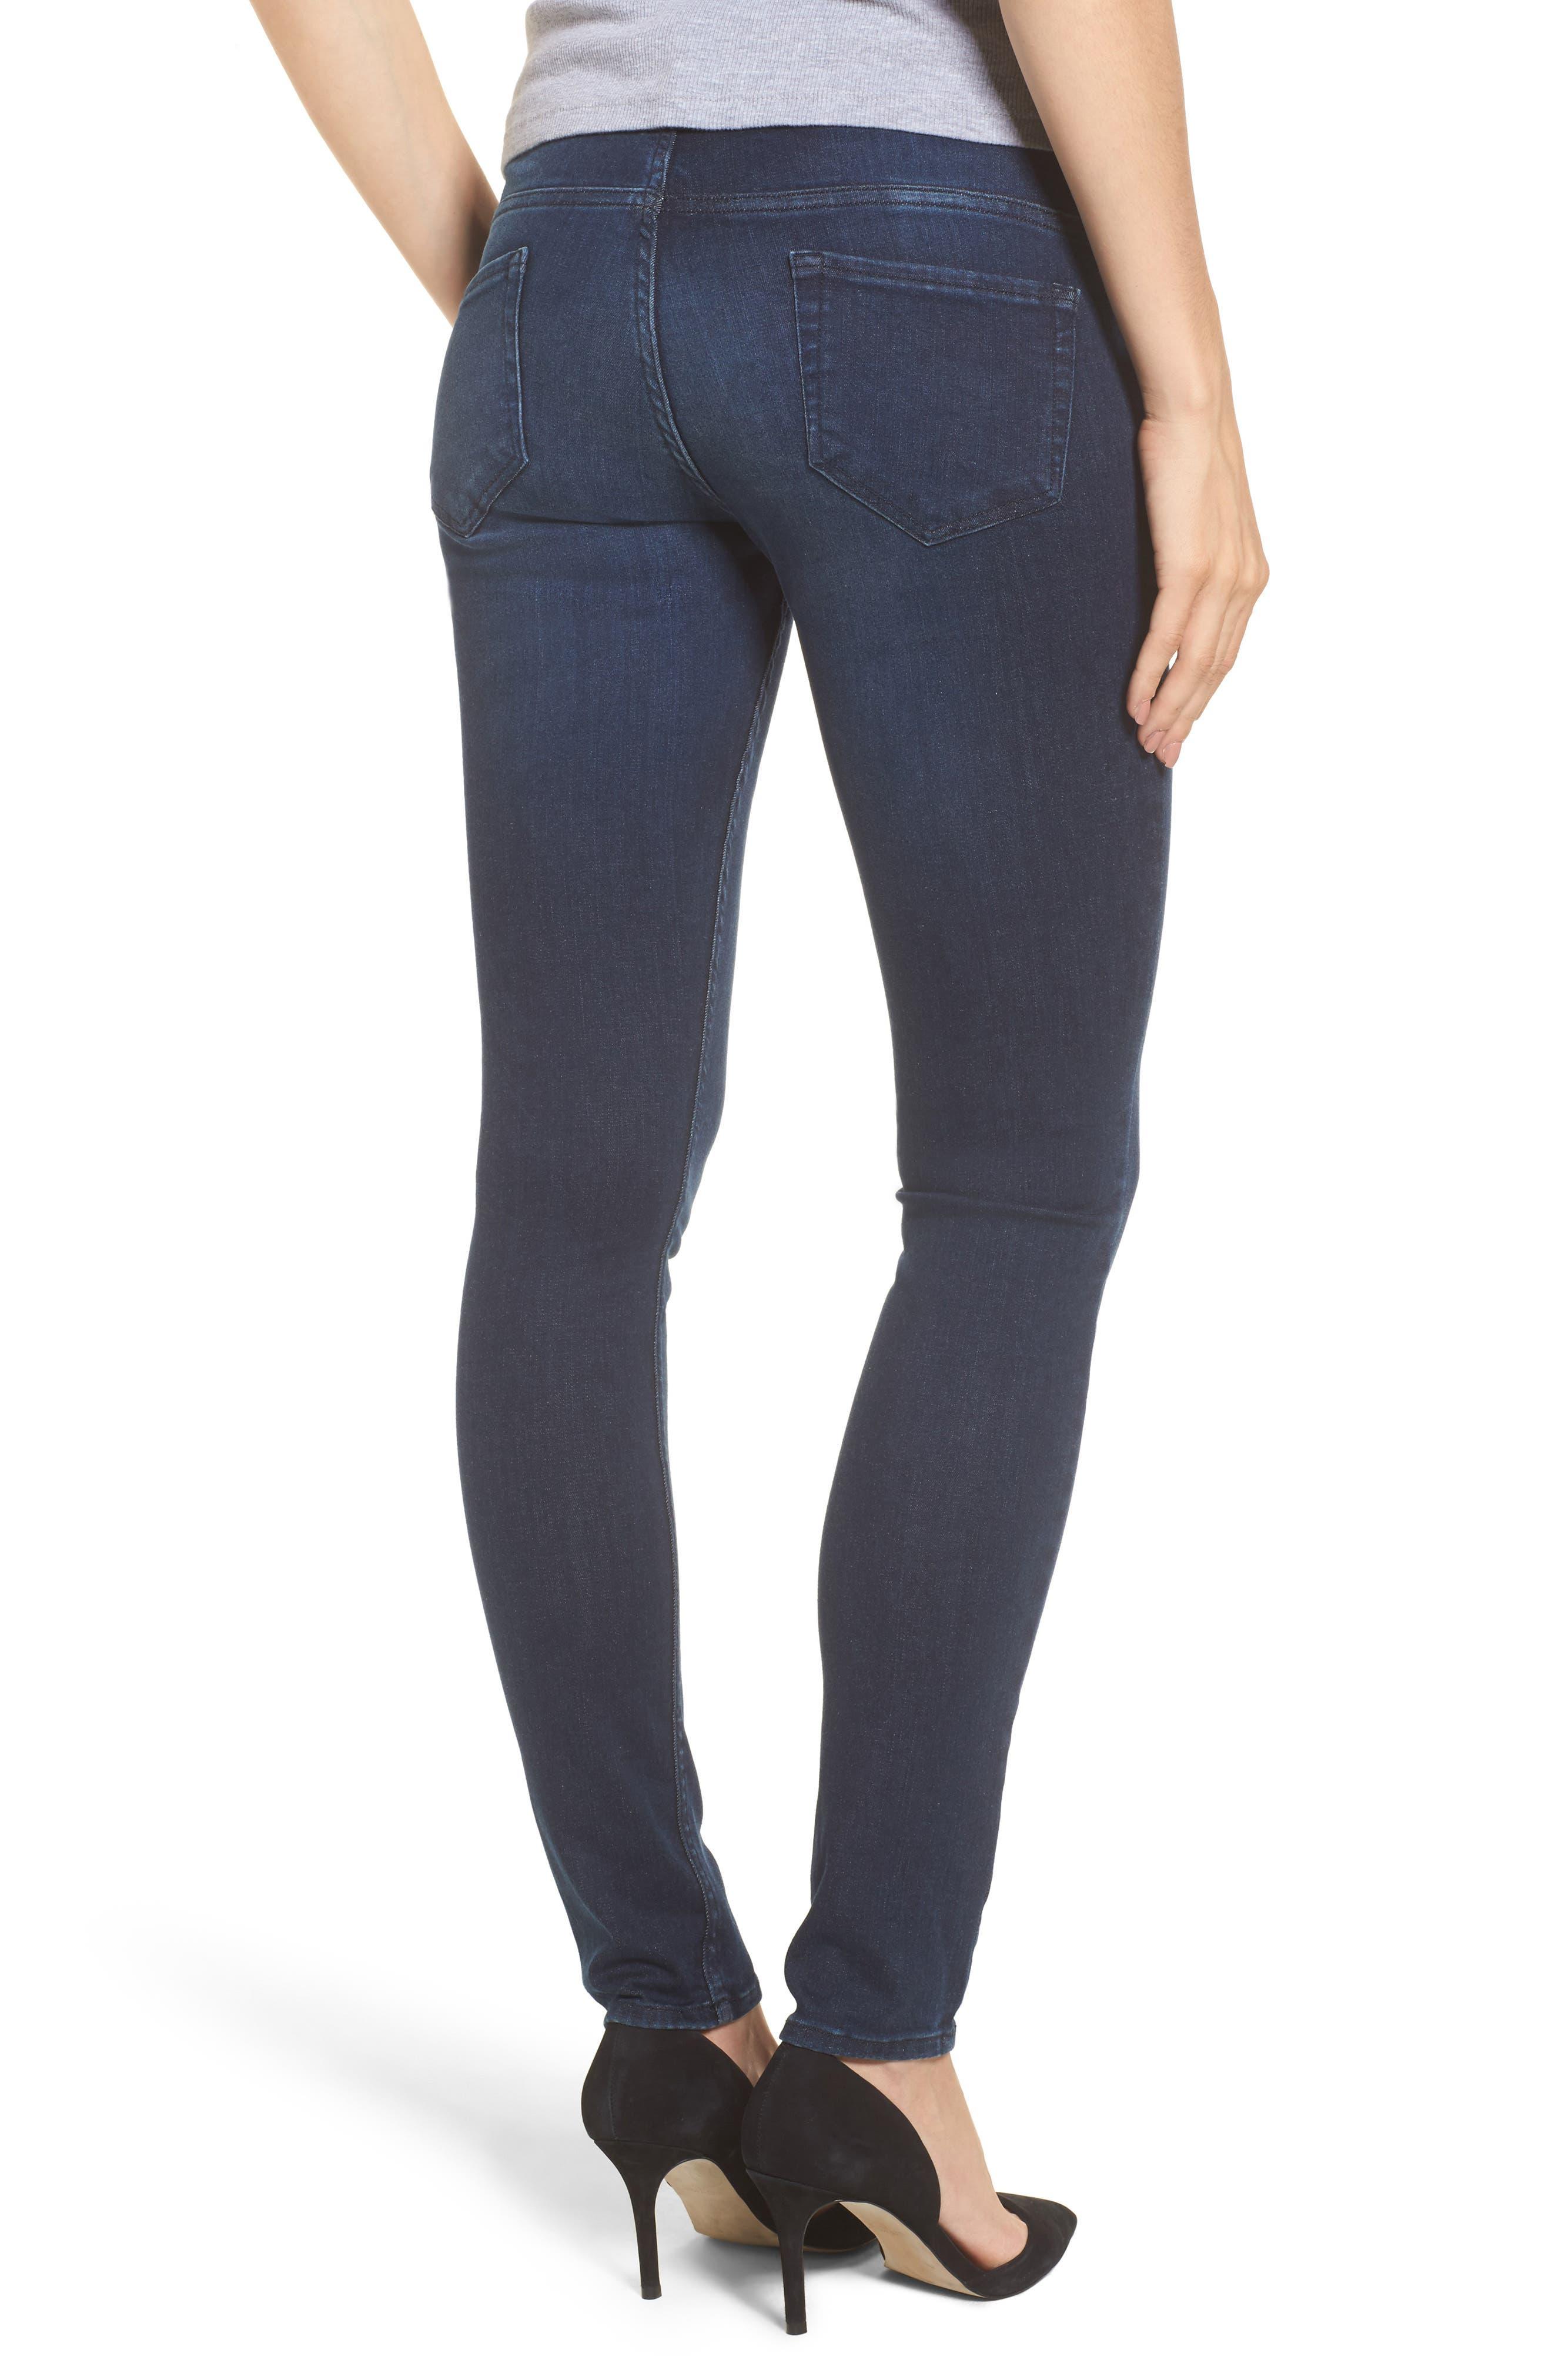 Super Stretch Maternity Skinny Jeans,                             Alternate thumbnail 2, color,                             INDIGO